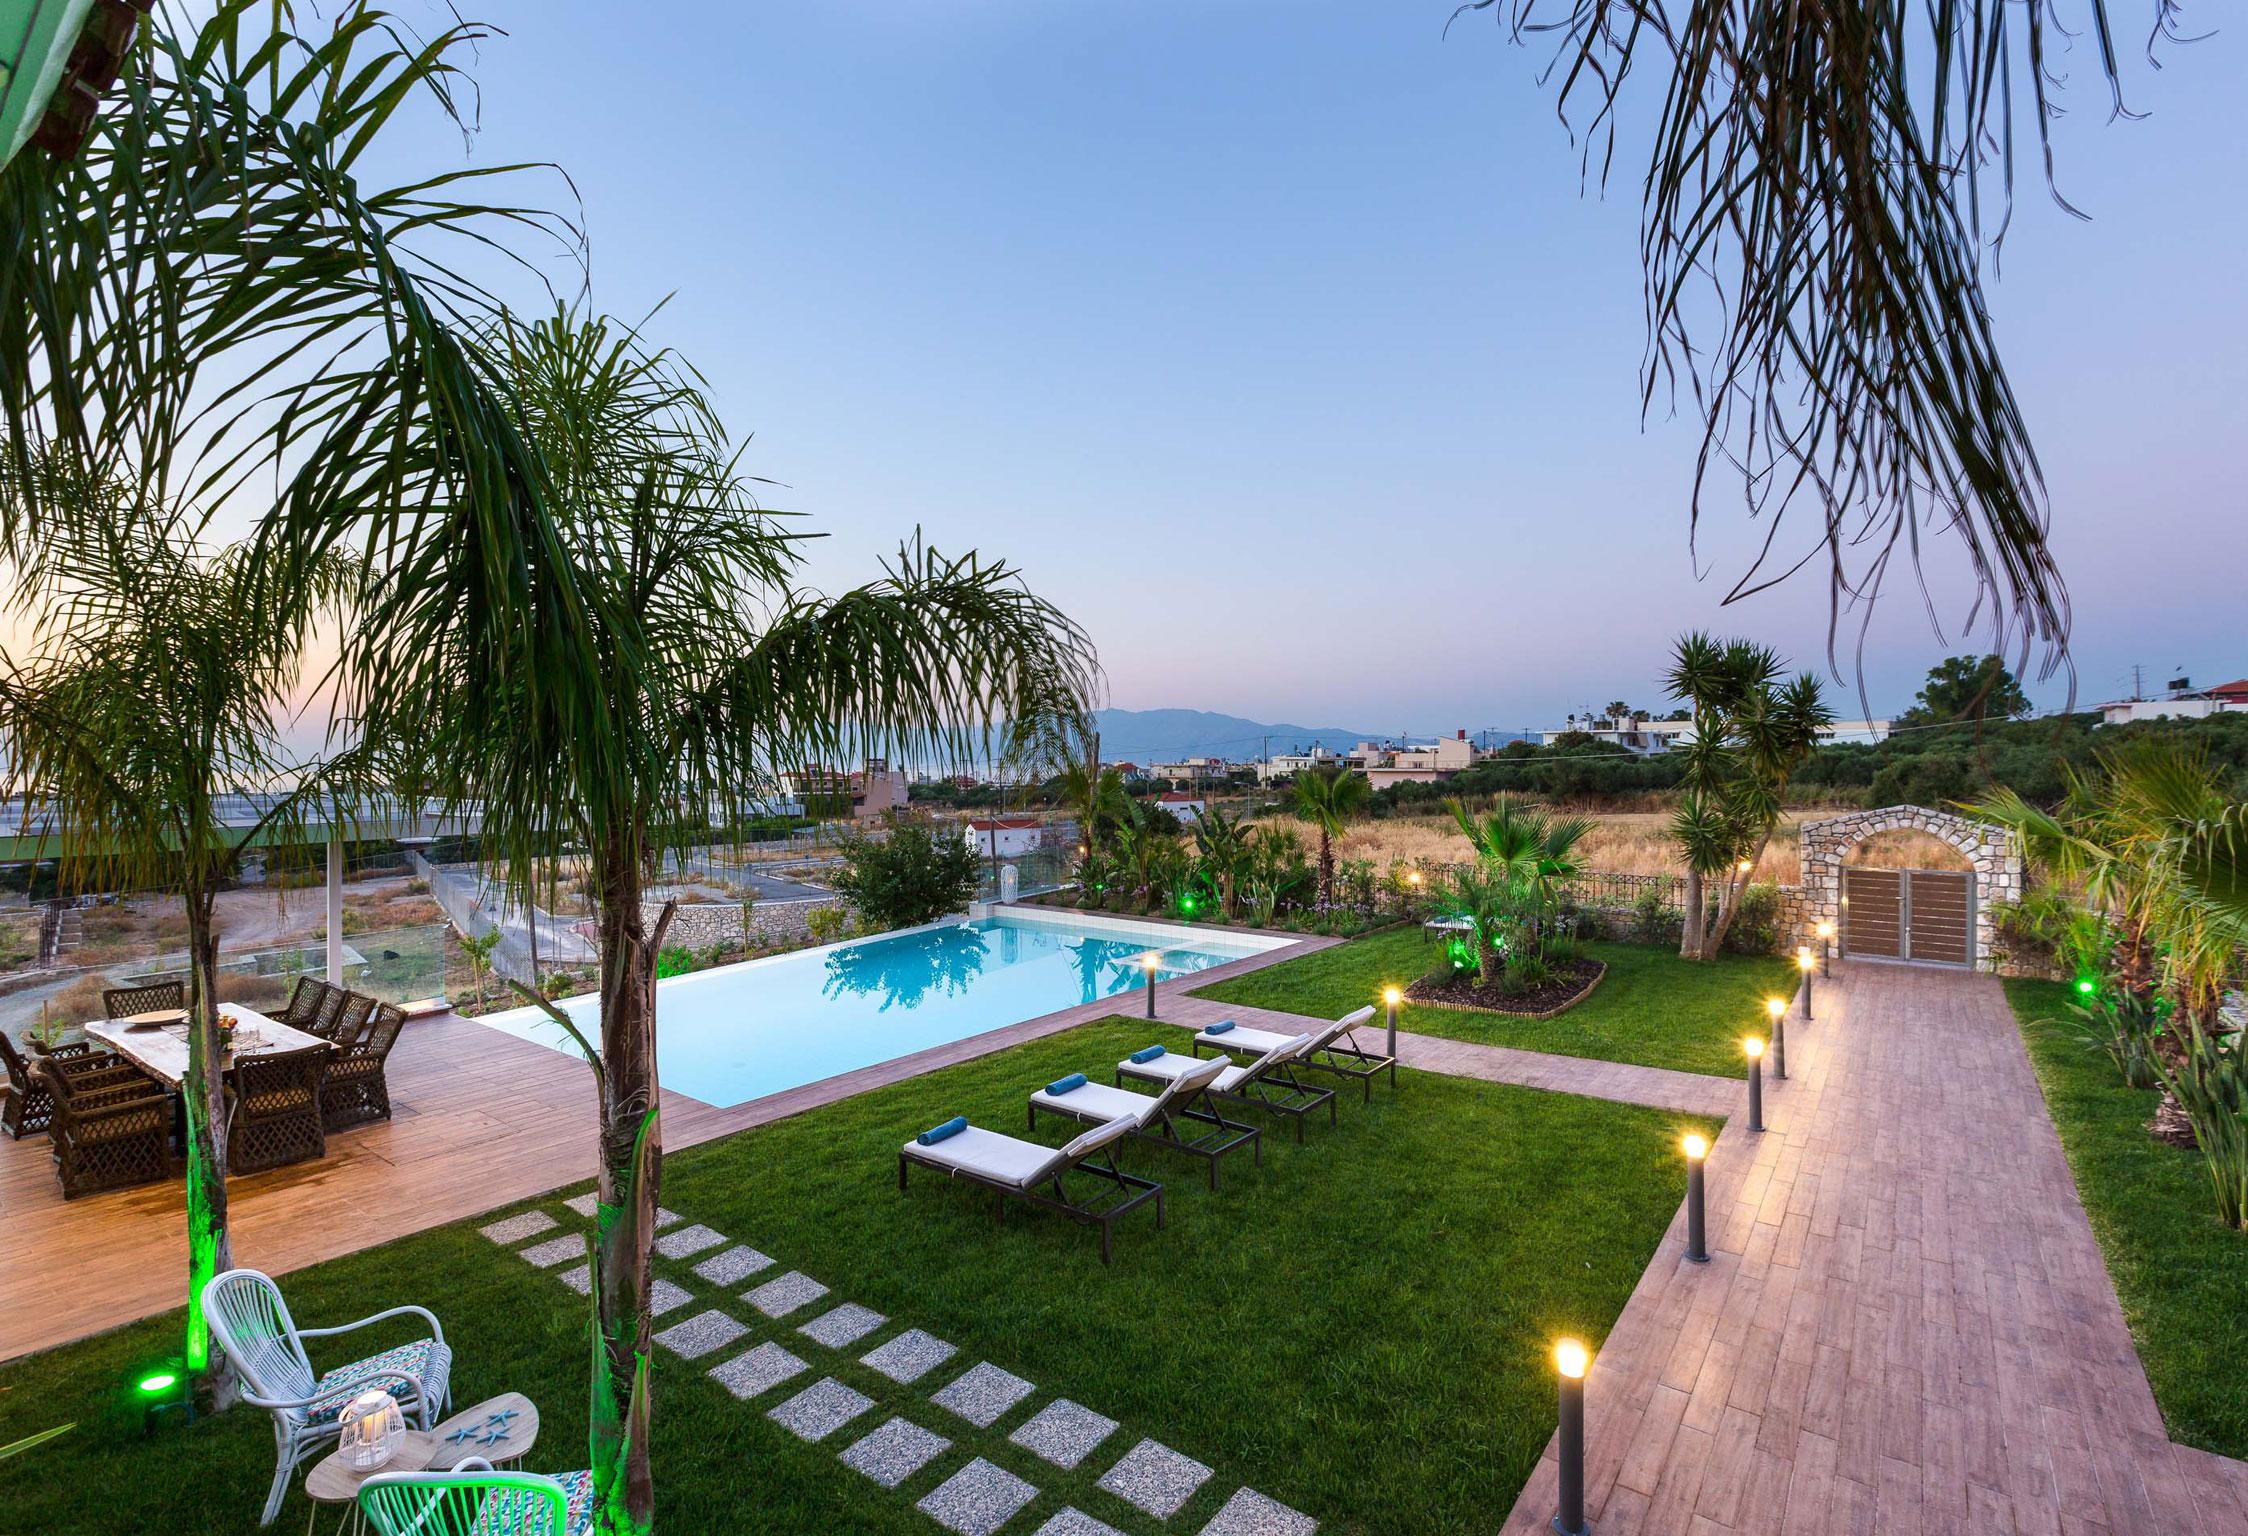 Crete Villa Alessandra jumbotron image